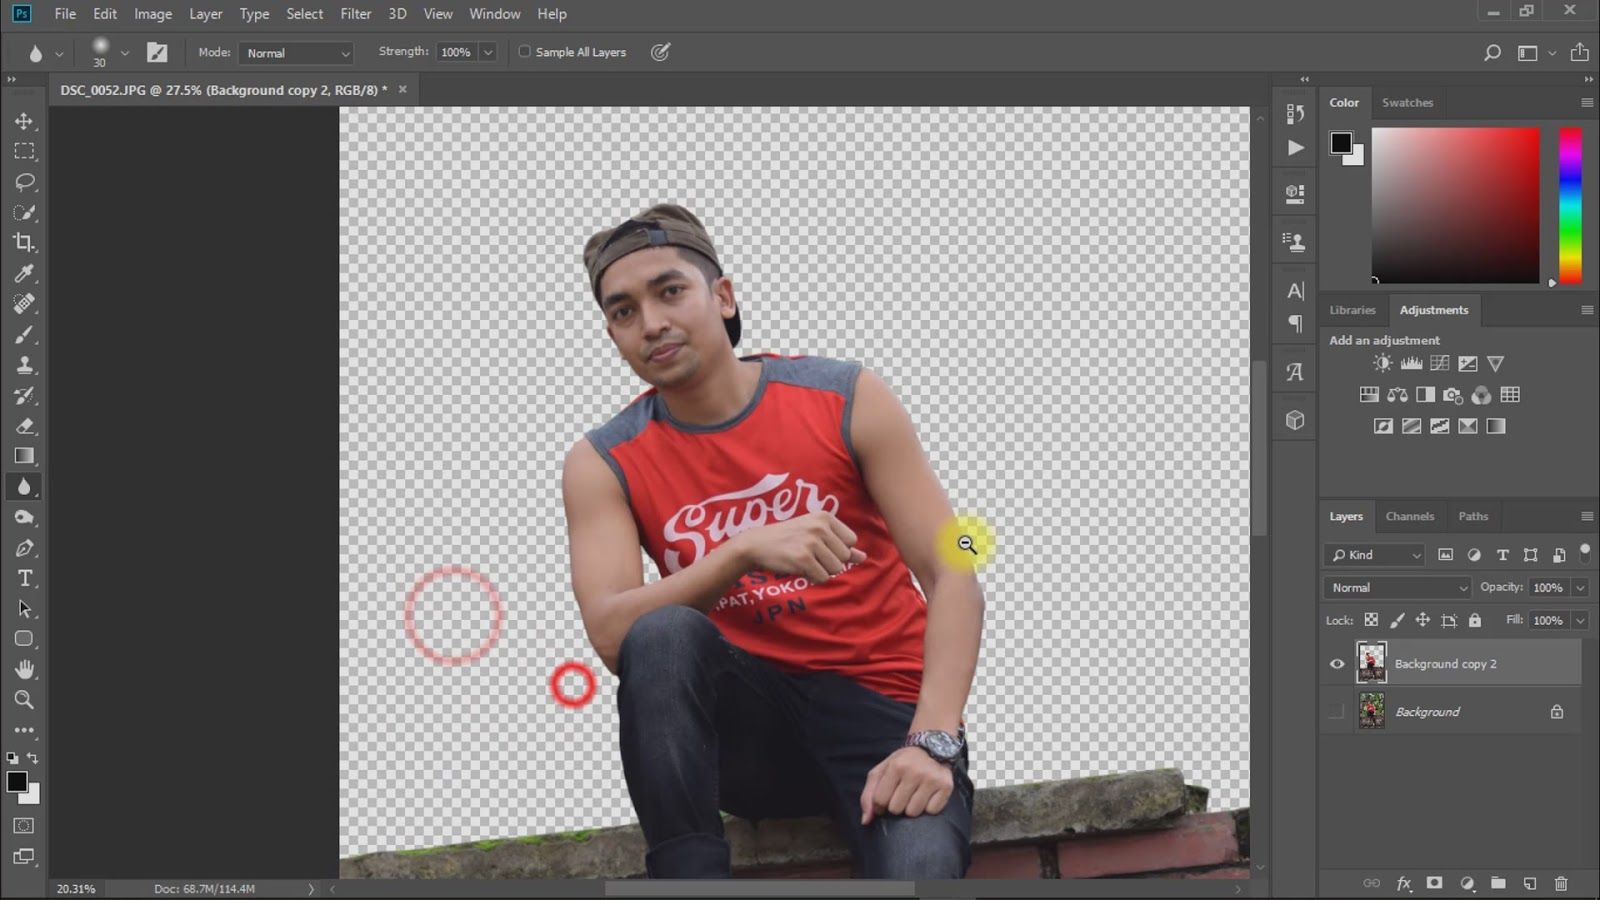 outdoor portrait photo manipulations working screenshot 2